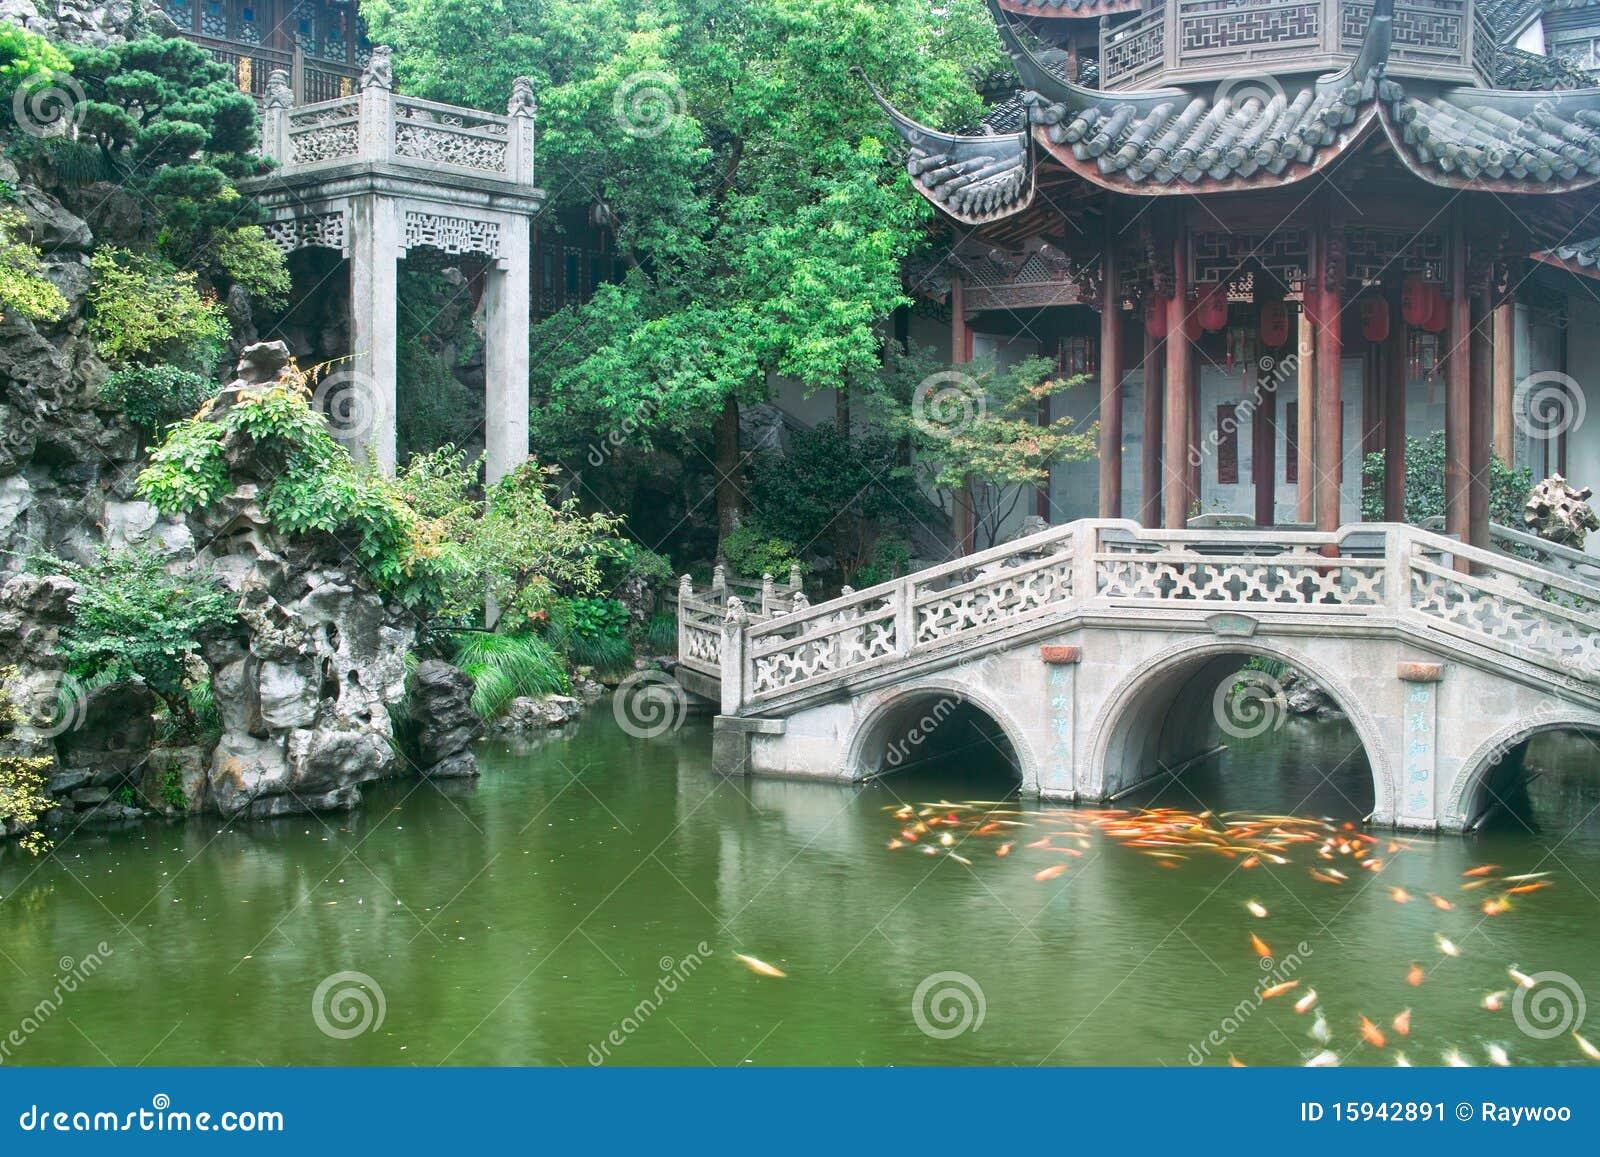 jardin chinois de type traditionnel image stock image du brique jardin 15942891. Black Bedroom Furniture Sets. Home Design Ideas